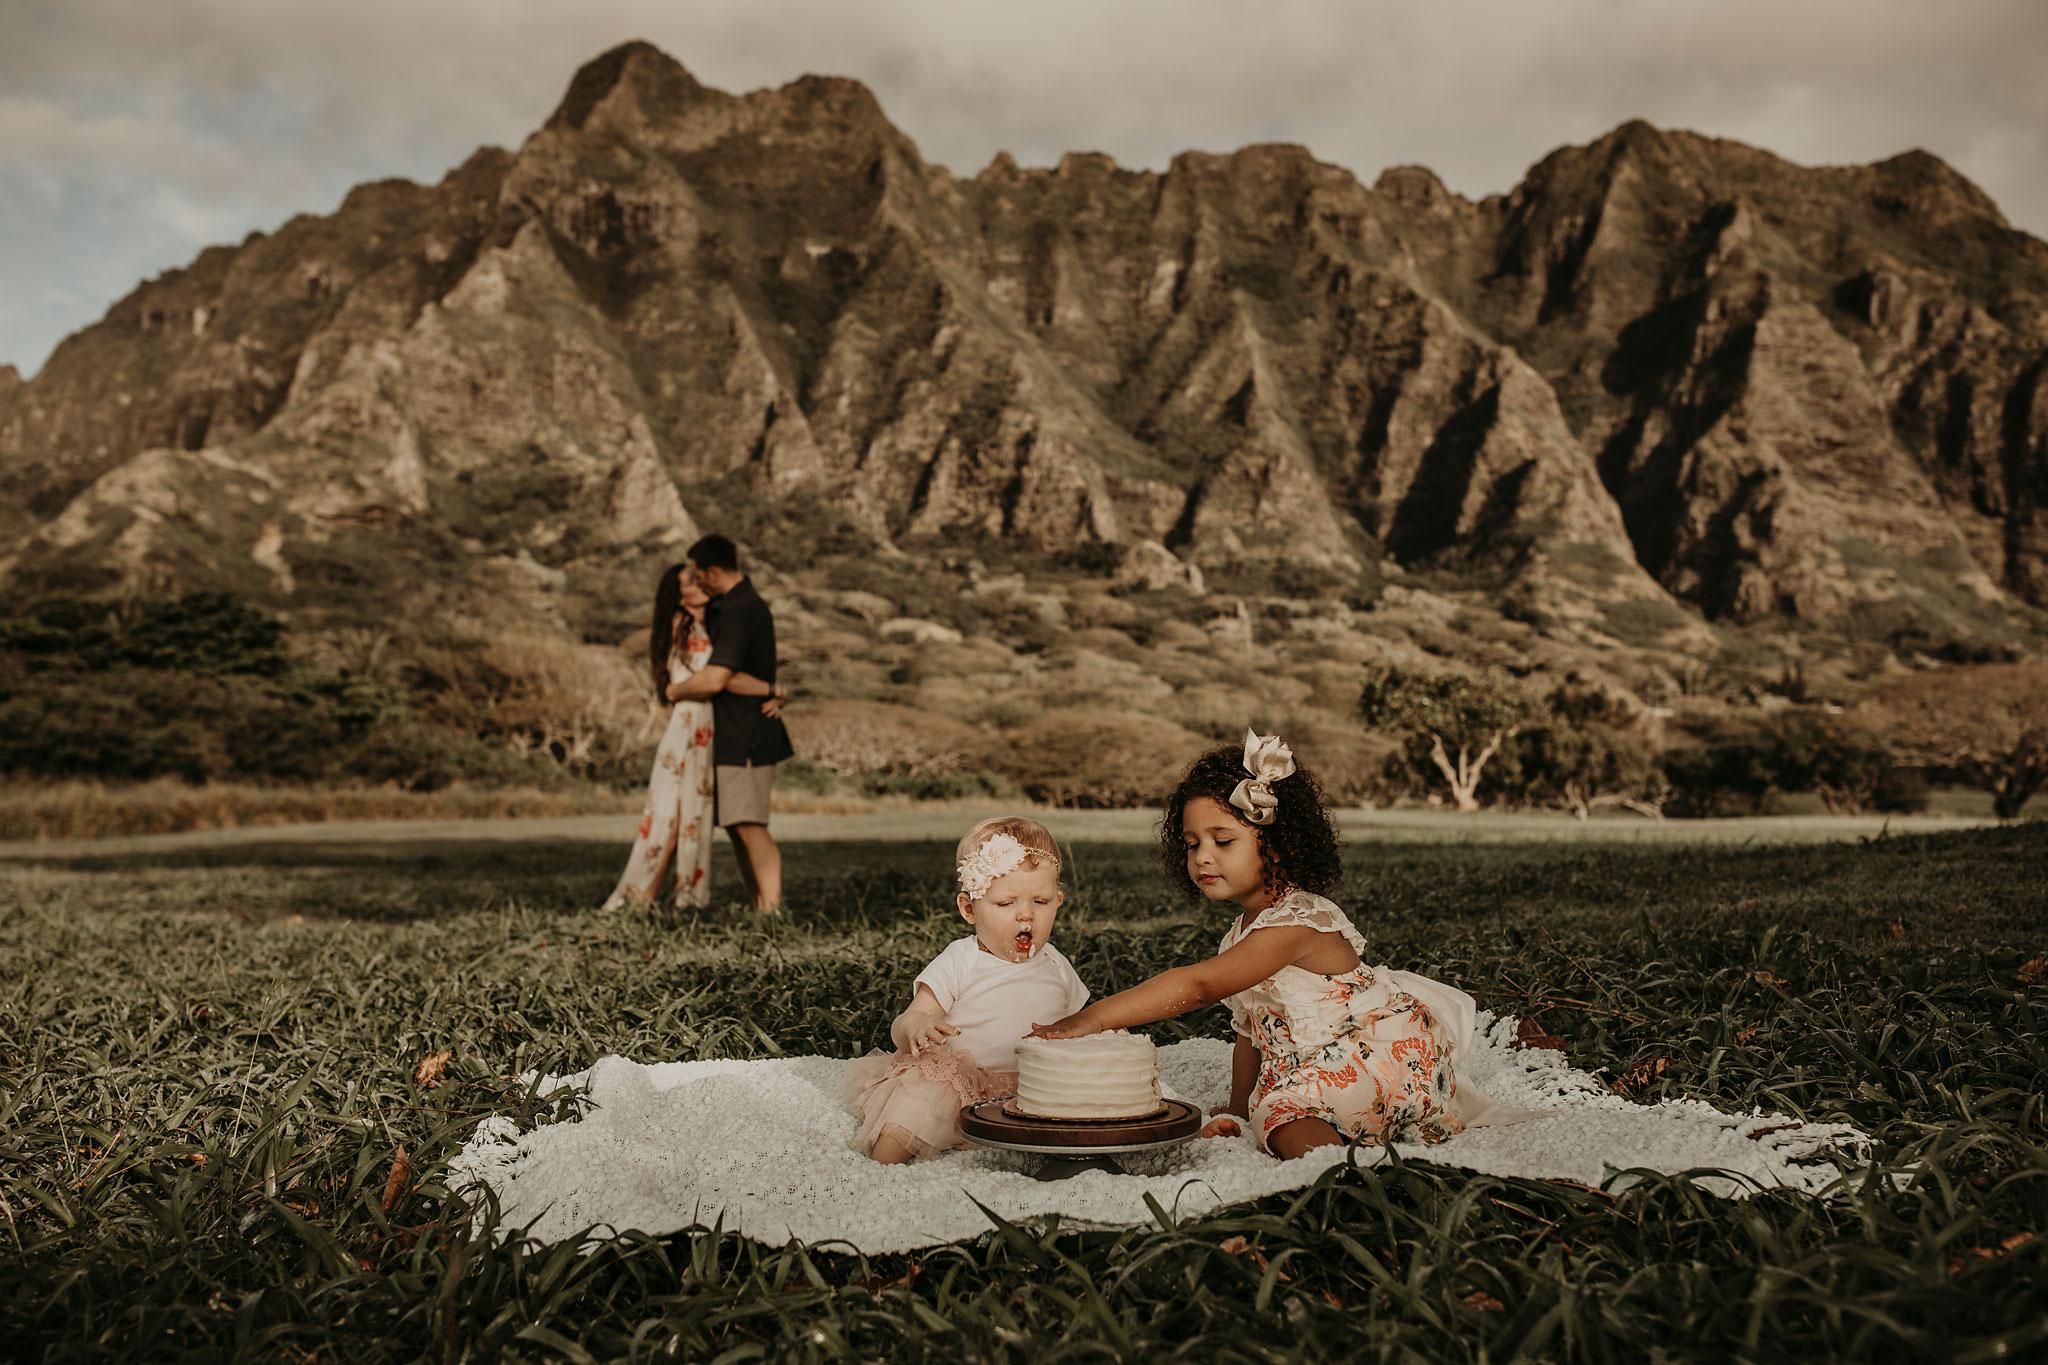 Sunrise-family-shoot-kualoa-ranch-31.jpg